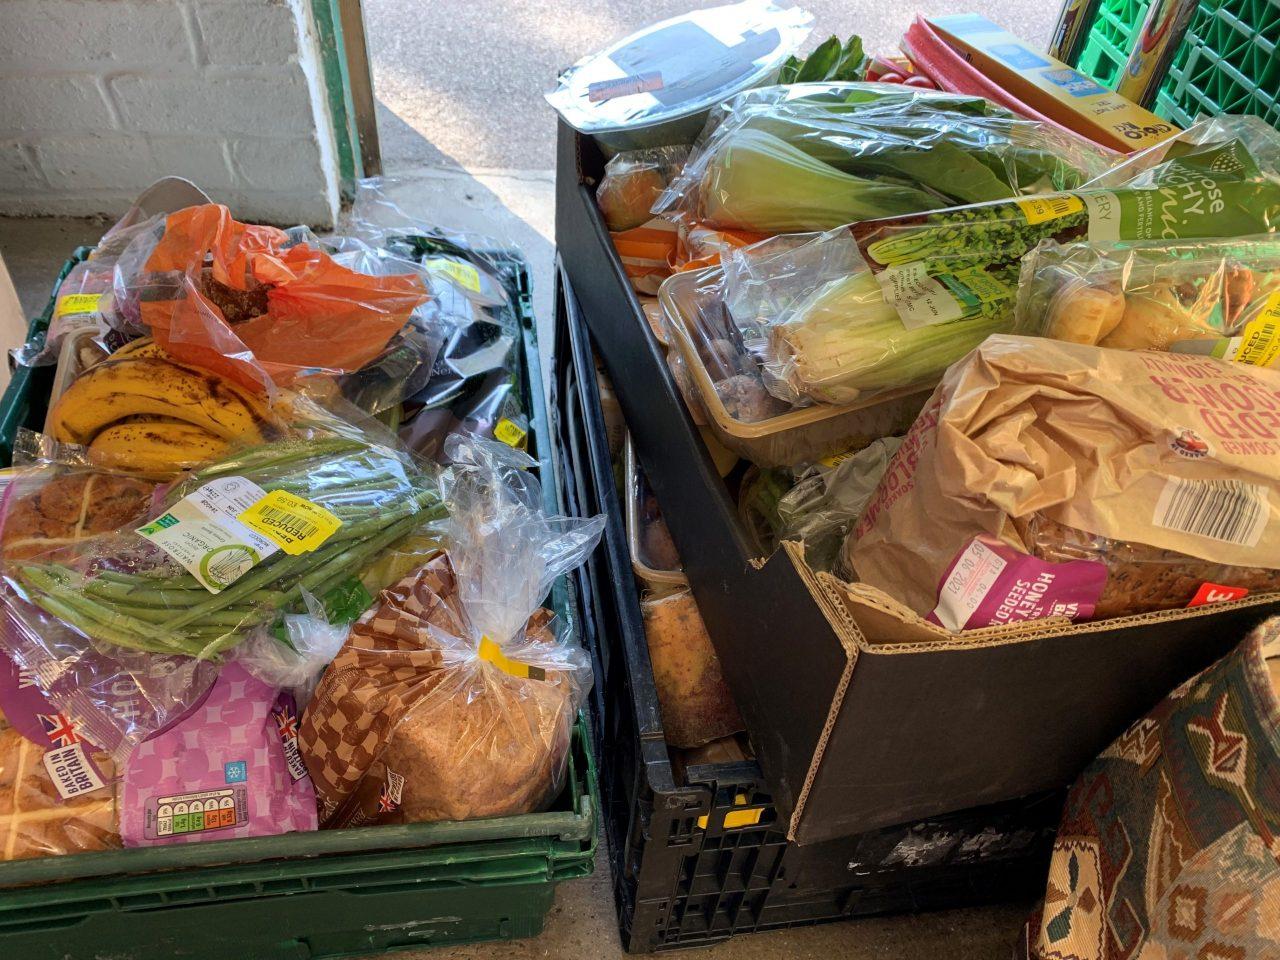 The Vegan Society donates 40 boxes of VEG 1 to those struggling post-pandemic